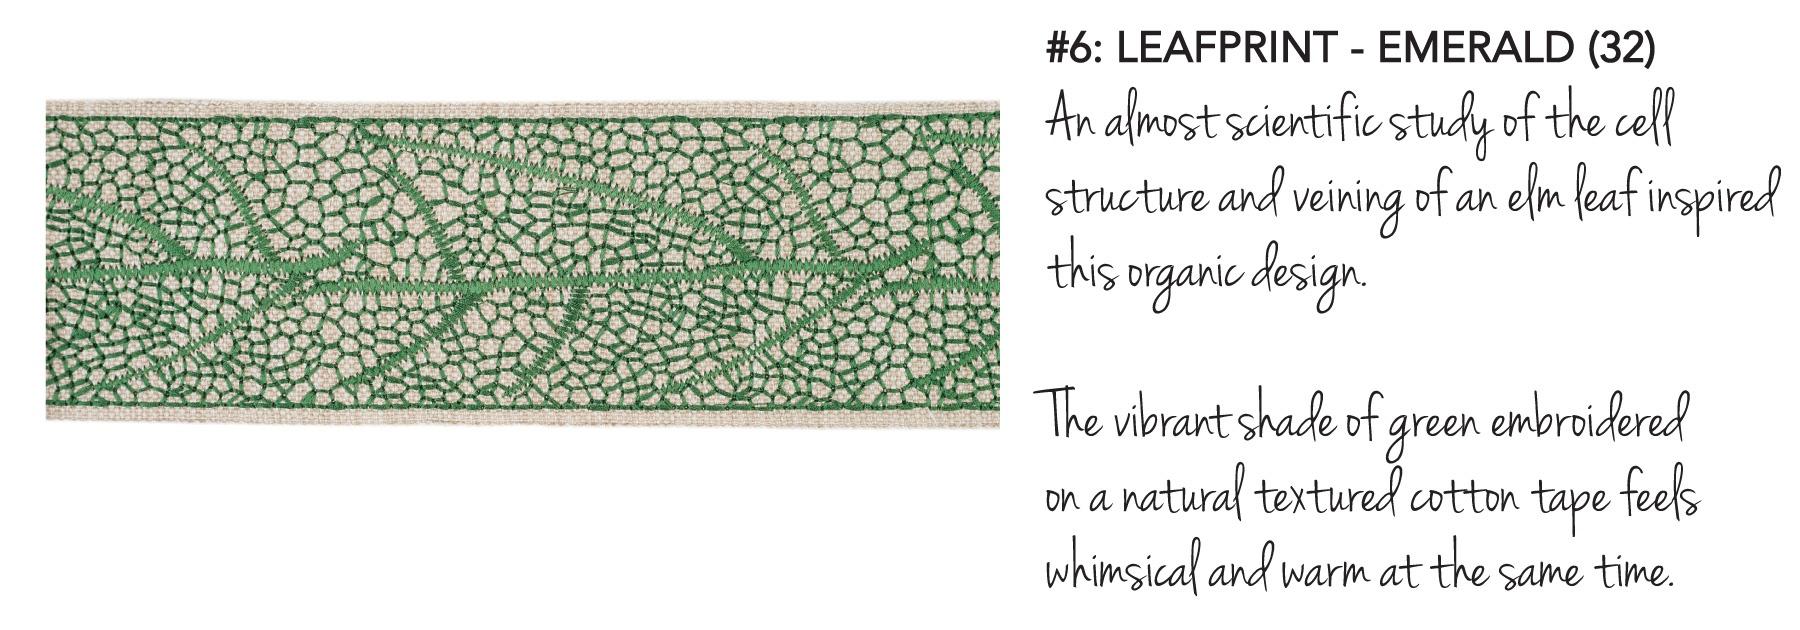 Leafprint_Emerald_#6